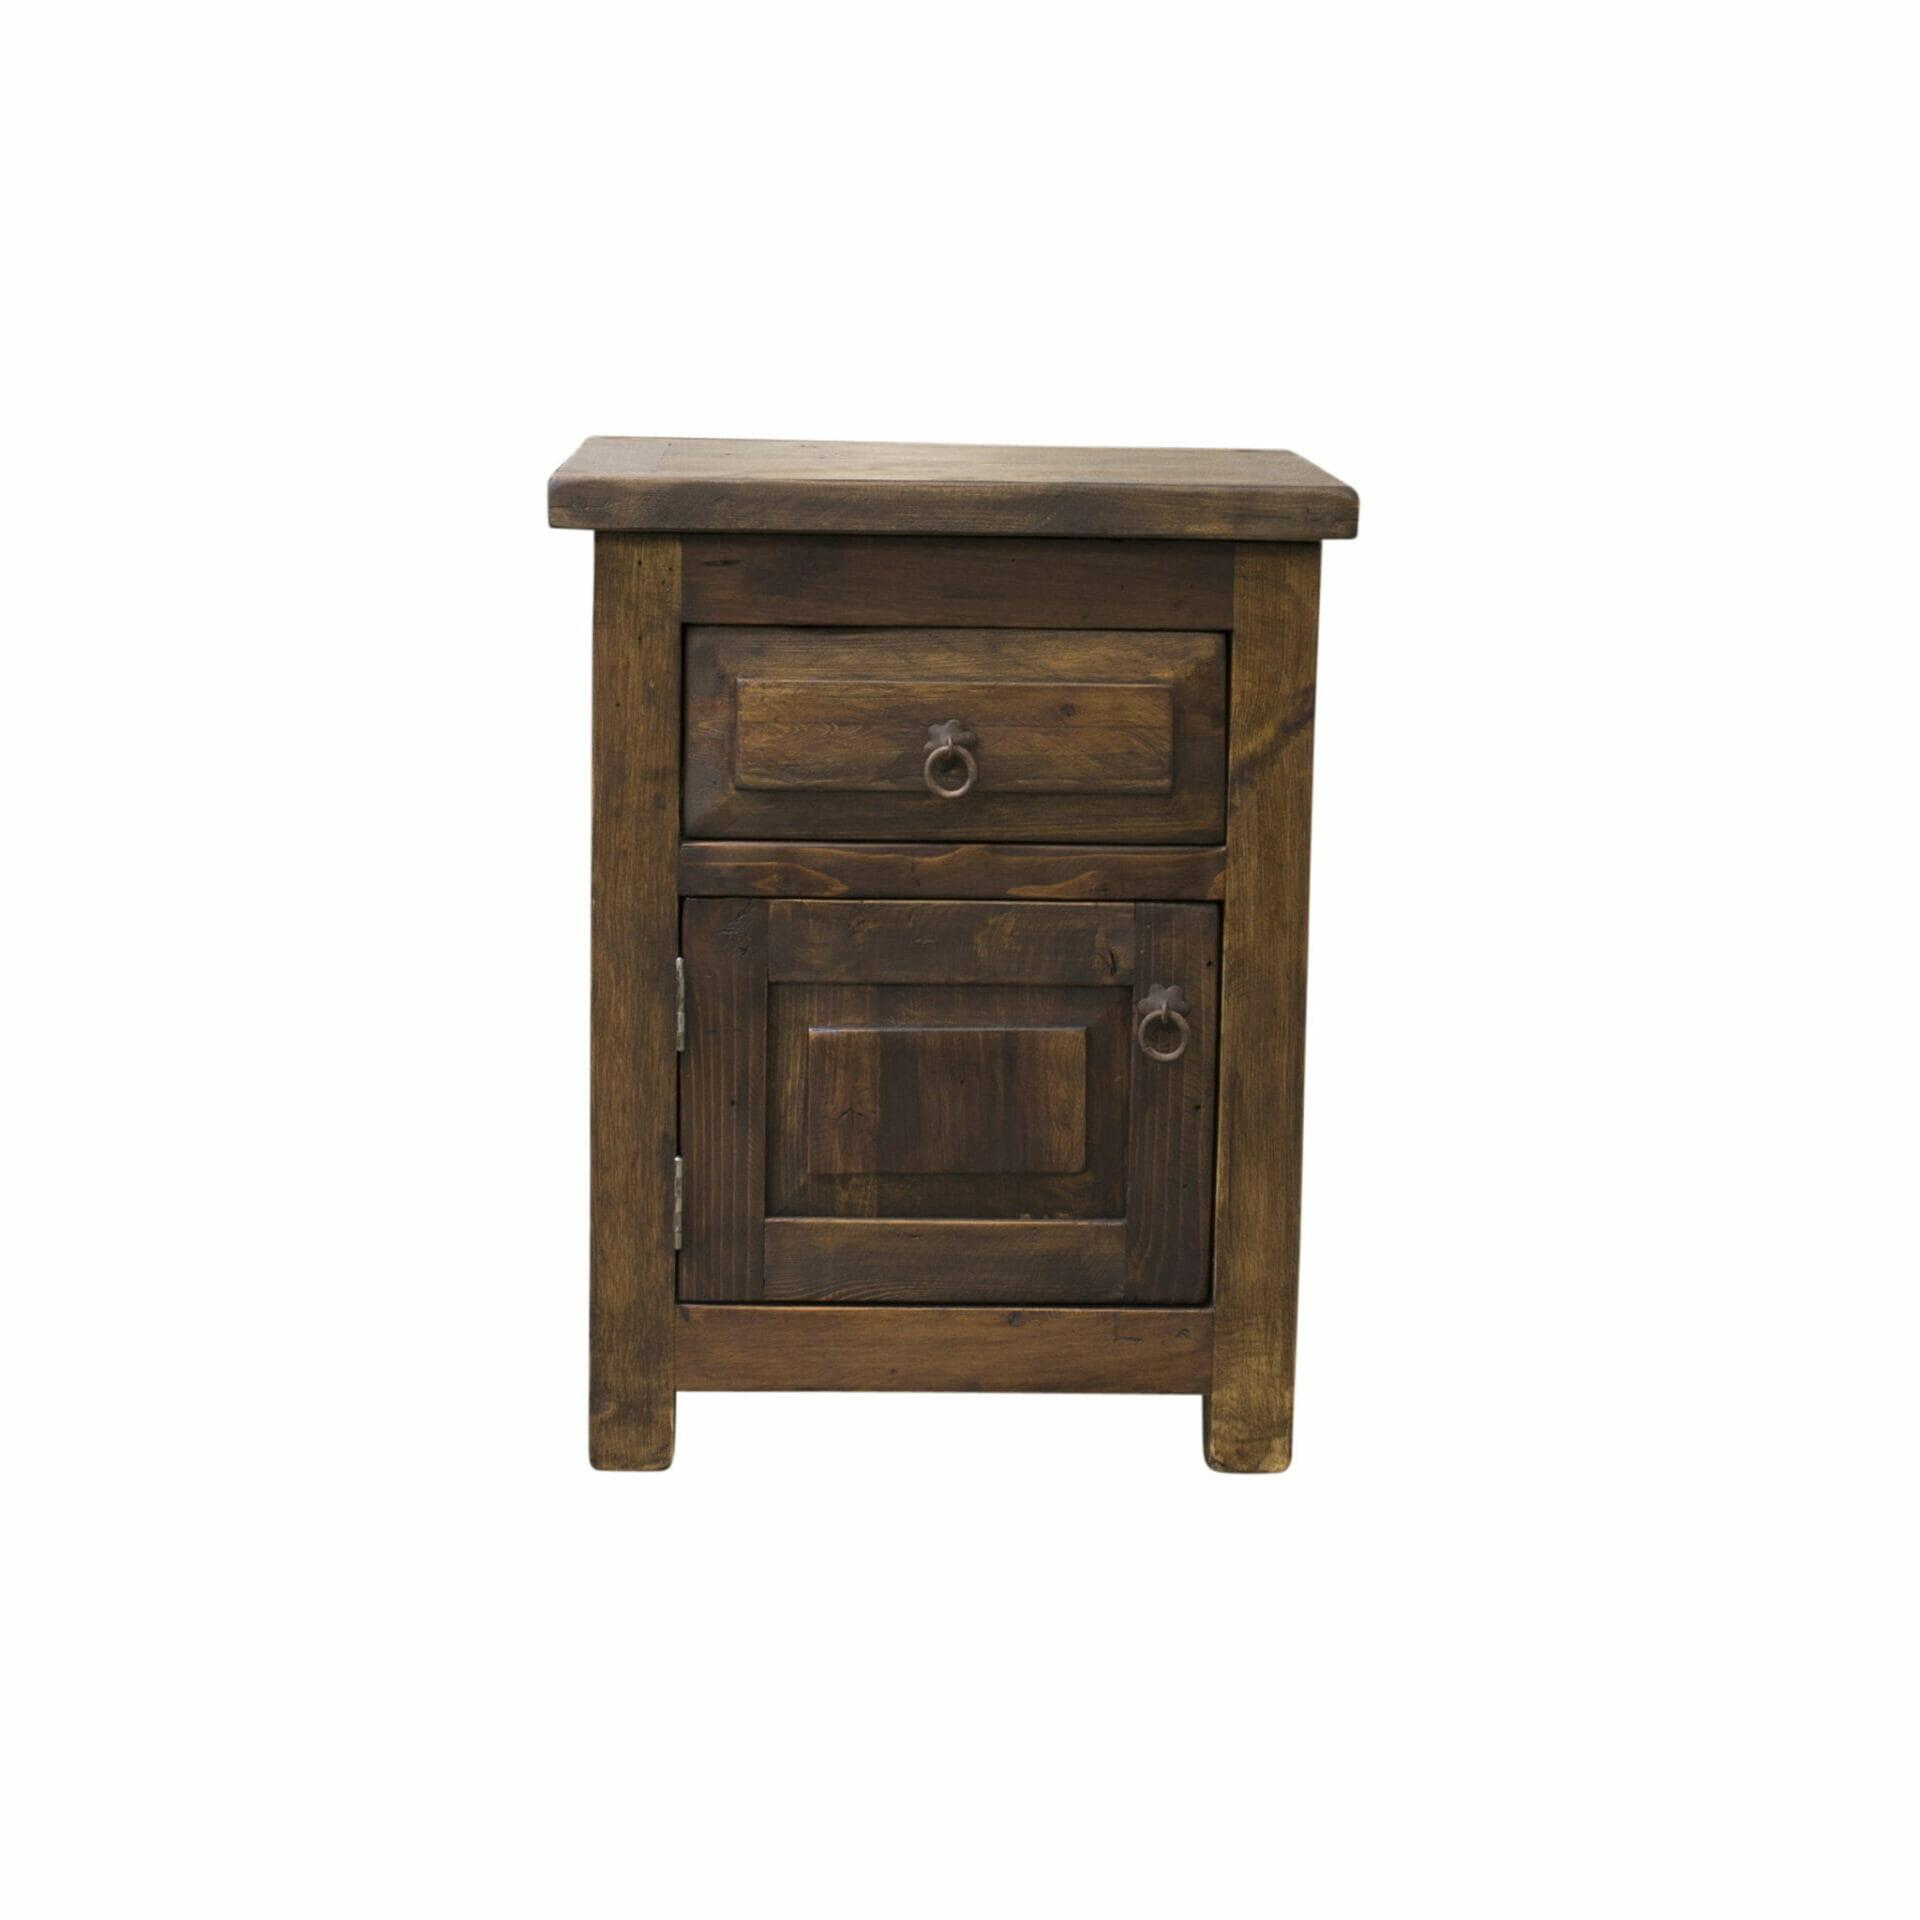 dickens reclaimed wood nightstands